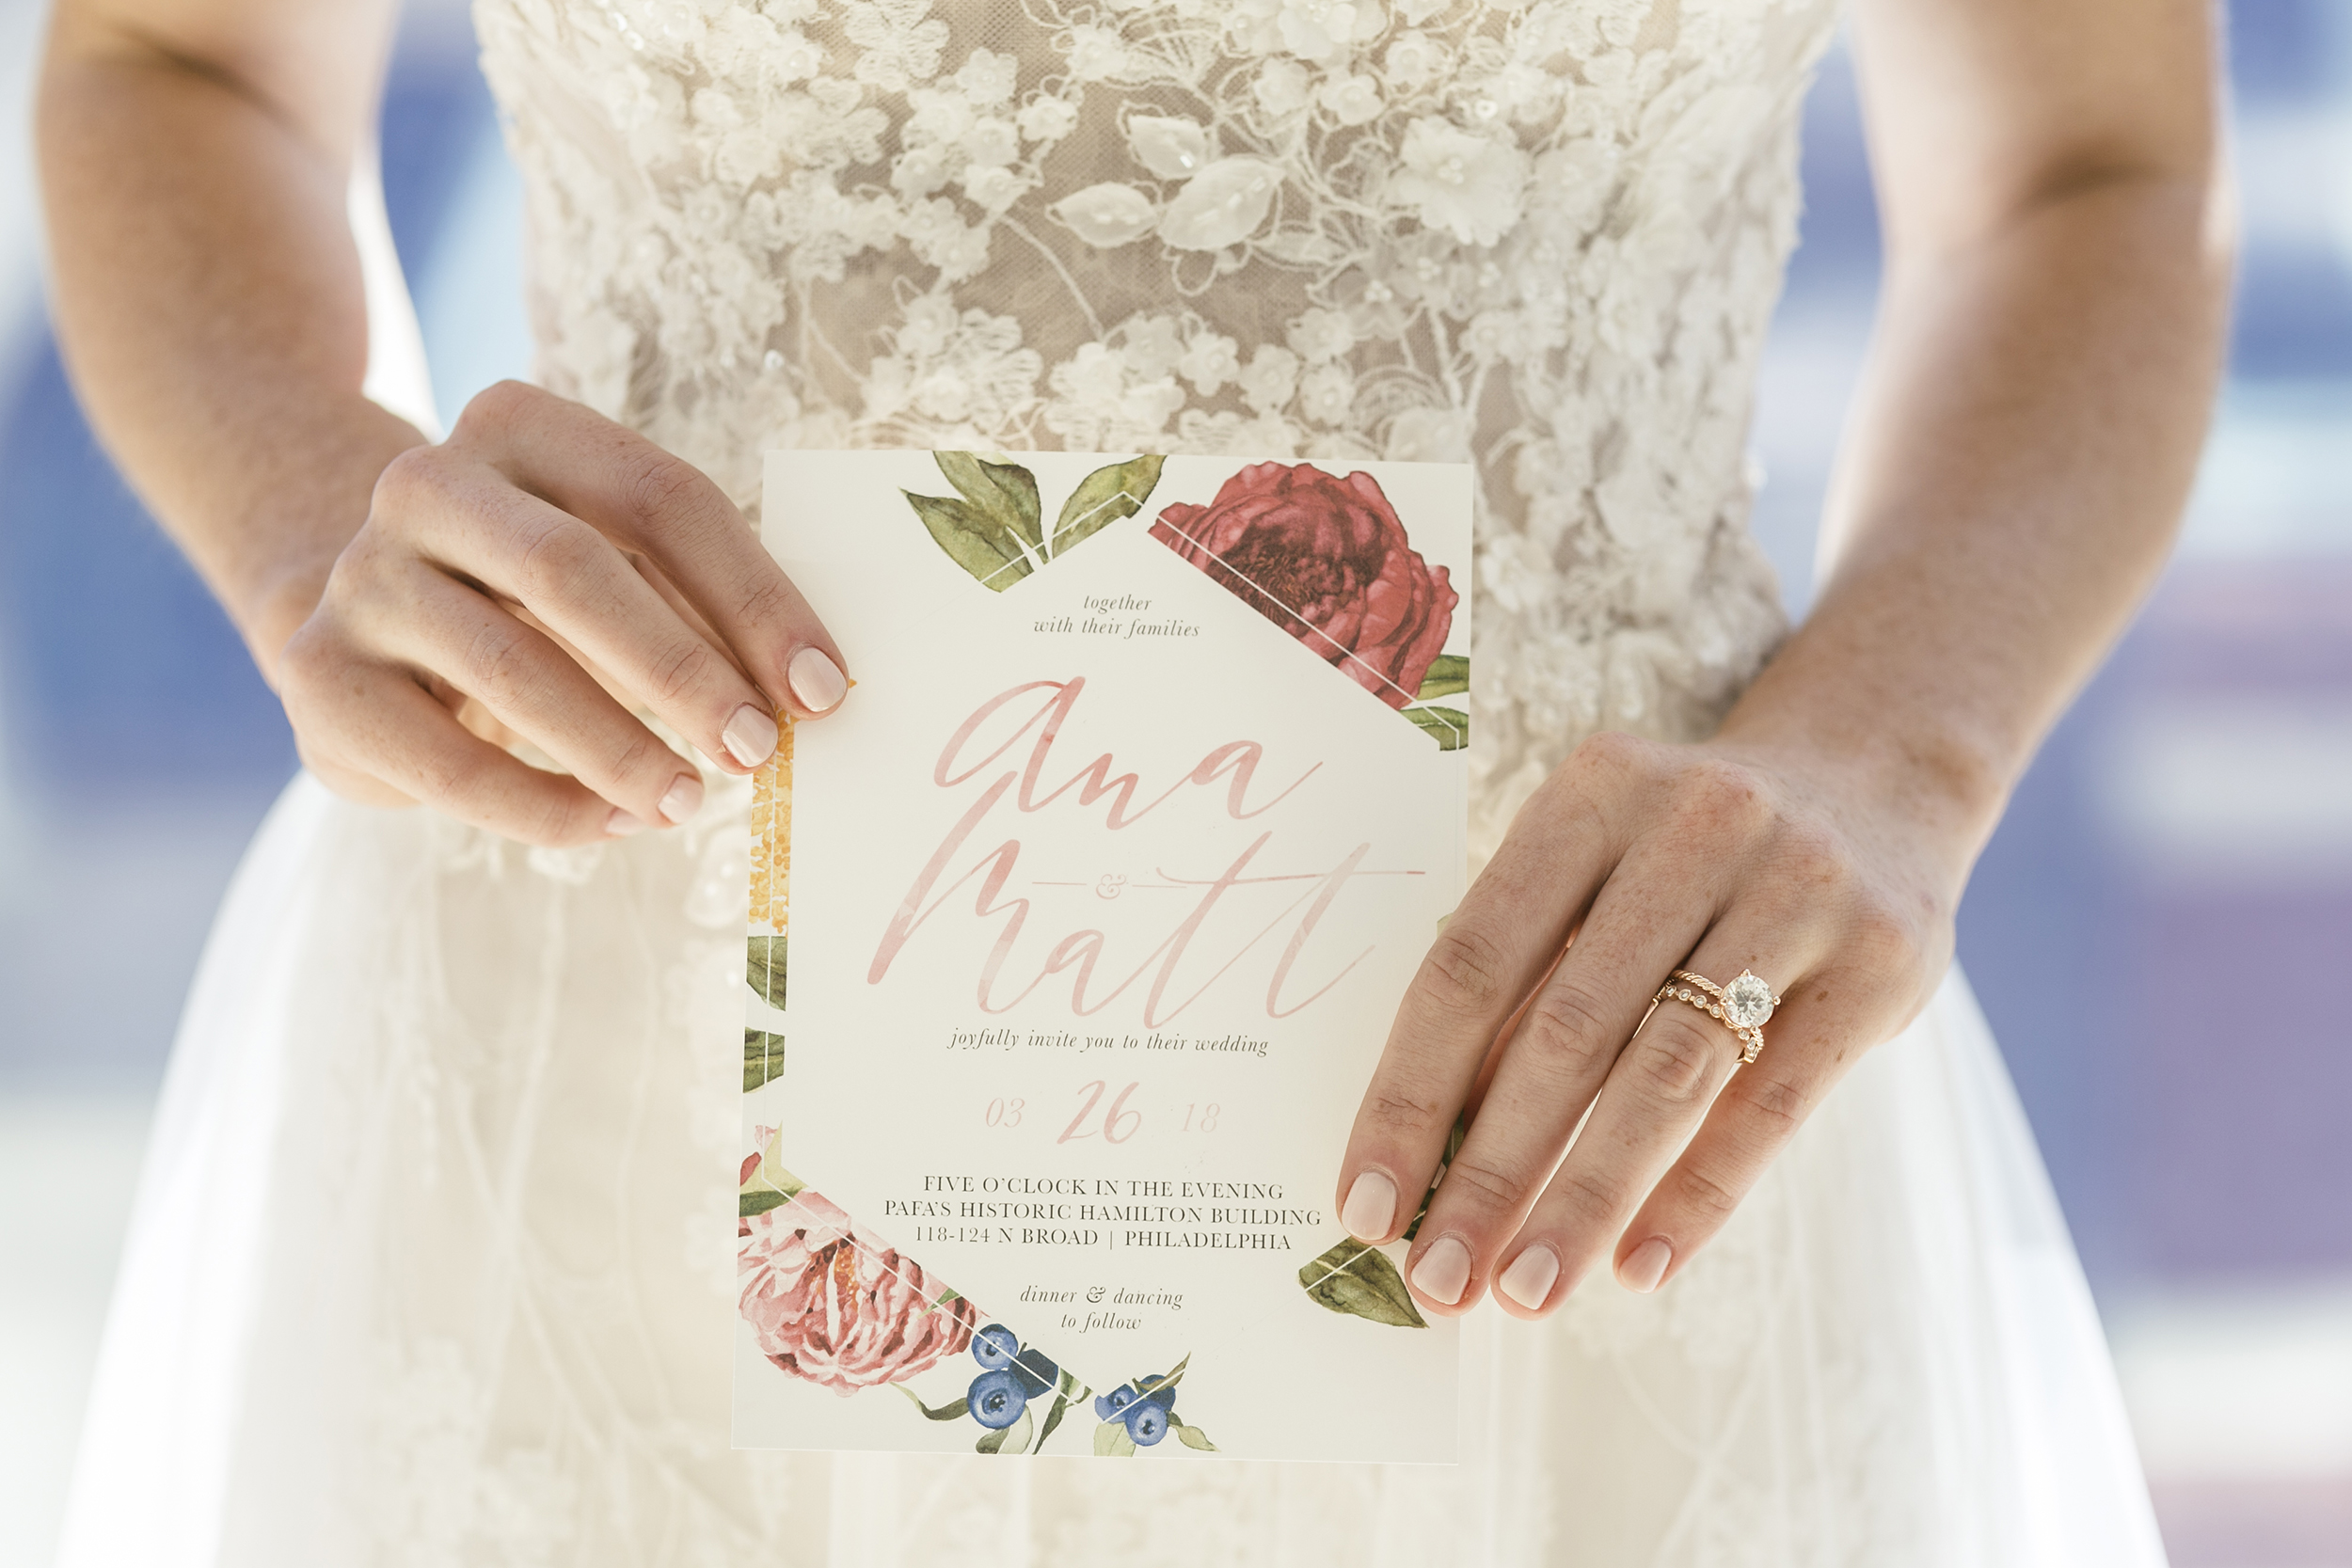 photography-wedding-weddings-natural-candid-pafa-pennsylvania academy-philadephia-philly-philadelphia wedding-mixed race-editorial-modern-fine-art-029.JPG